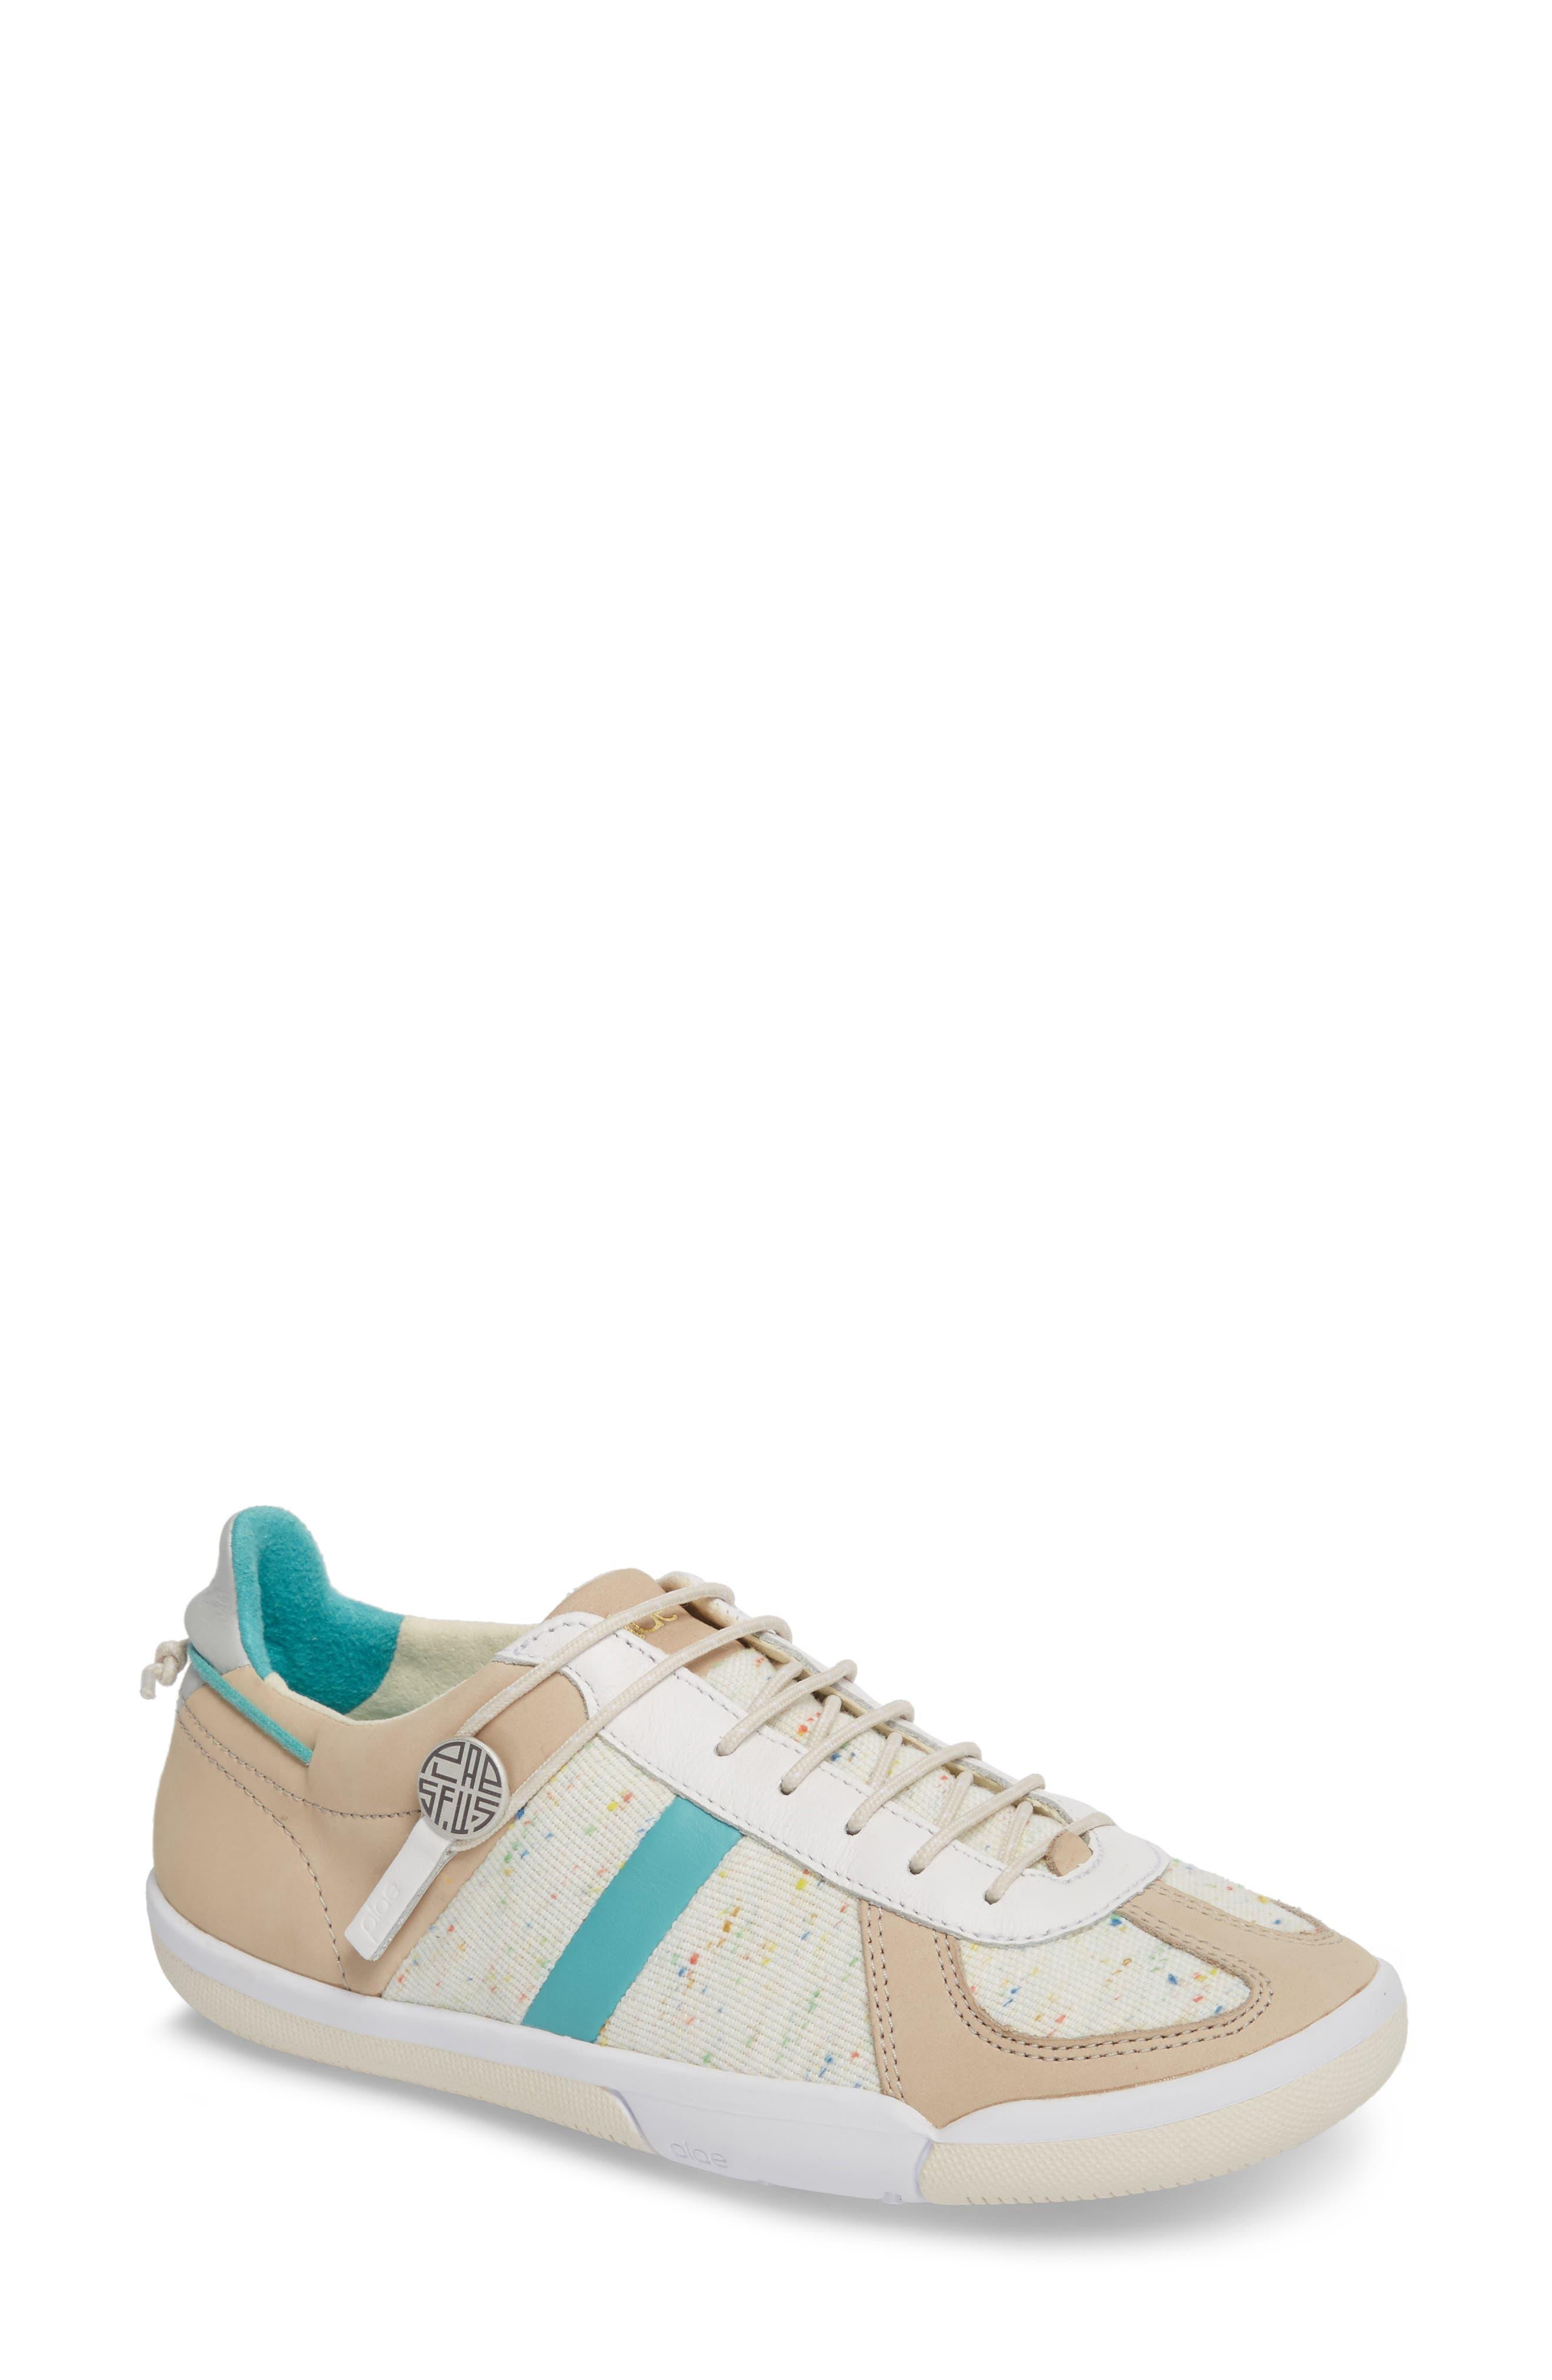 Butler Sneaker,                         Main,                         color, TURTLEDOVE LEATHER